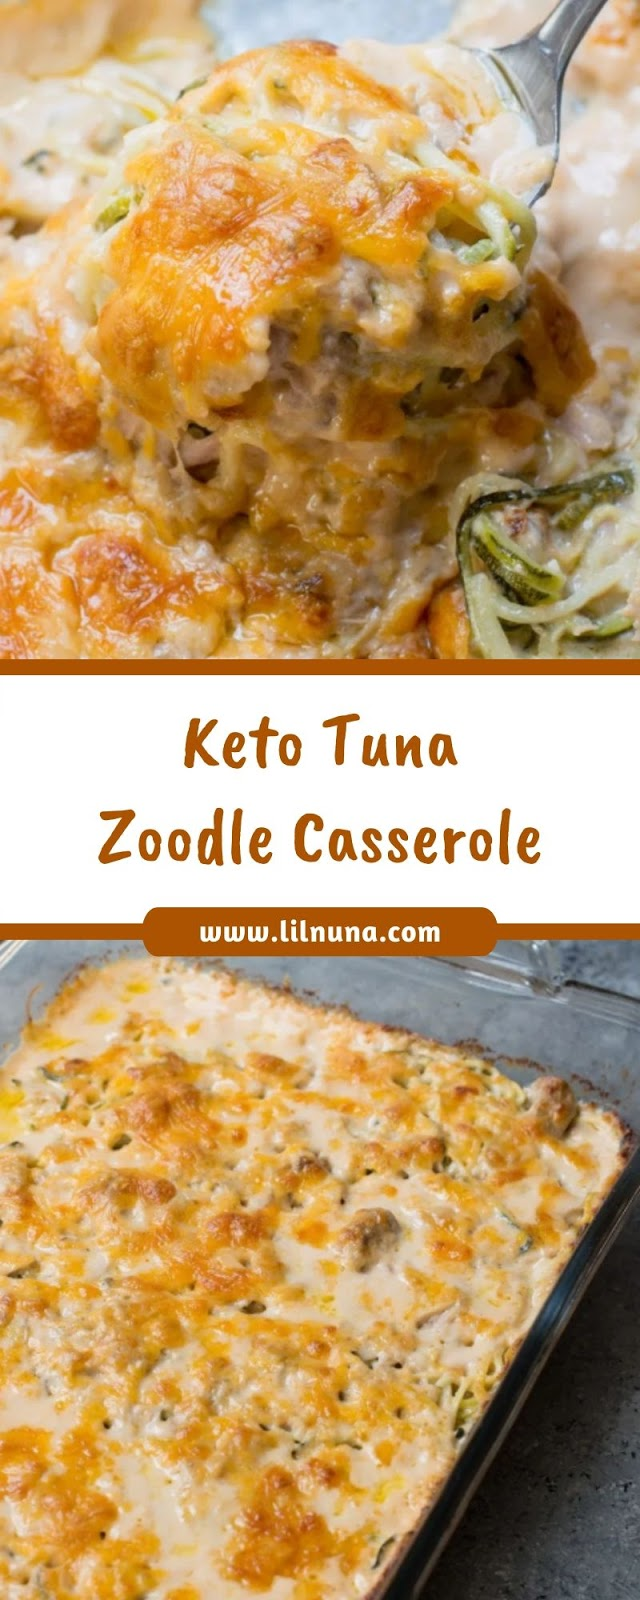 Keto Tuna Zoodle Casserole